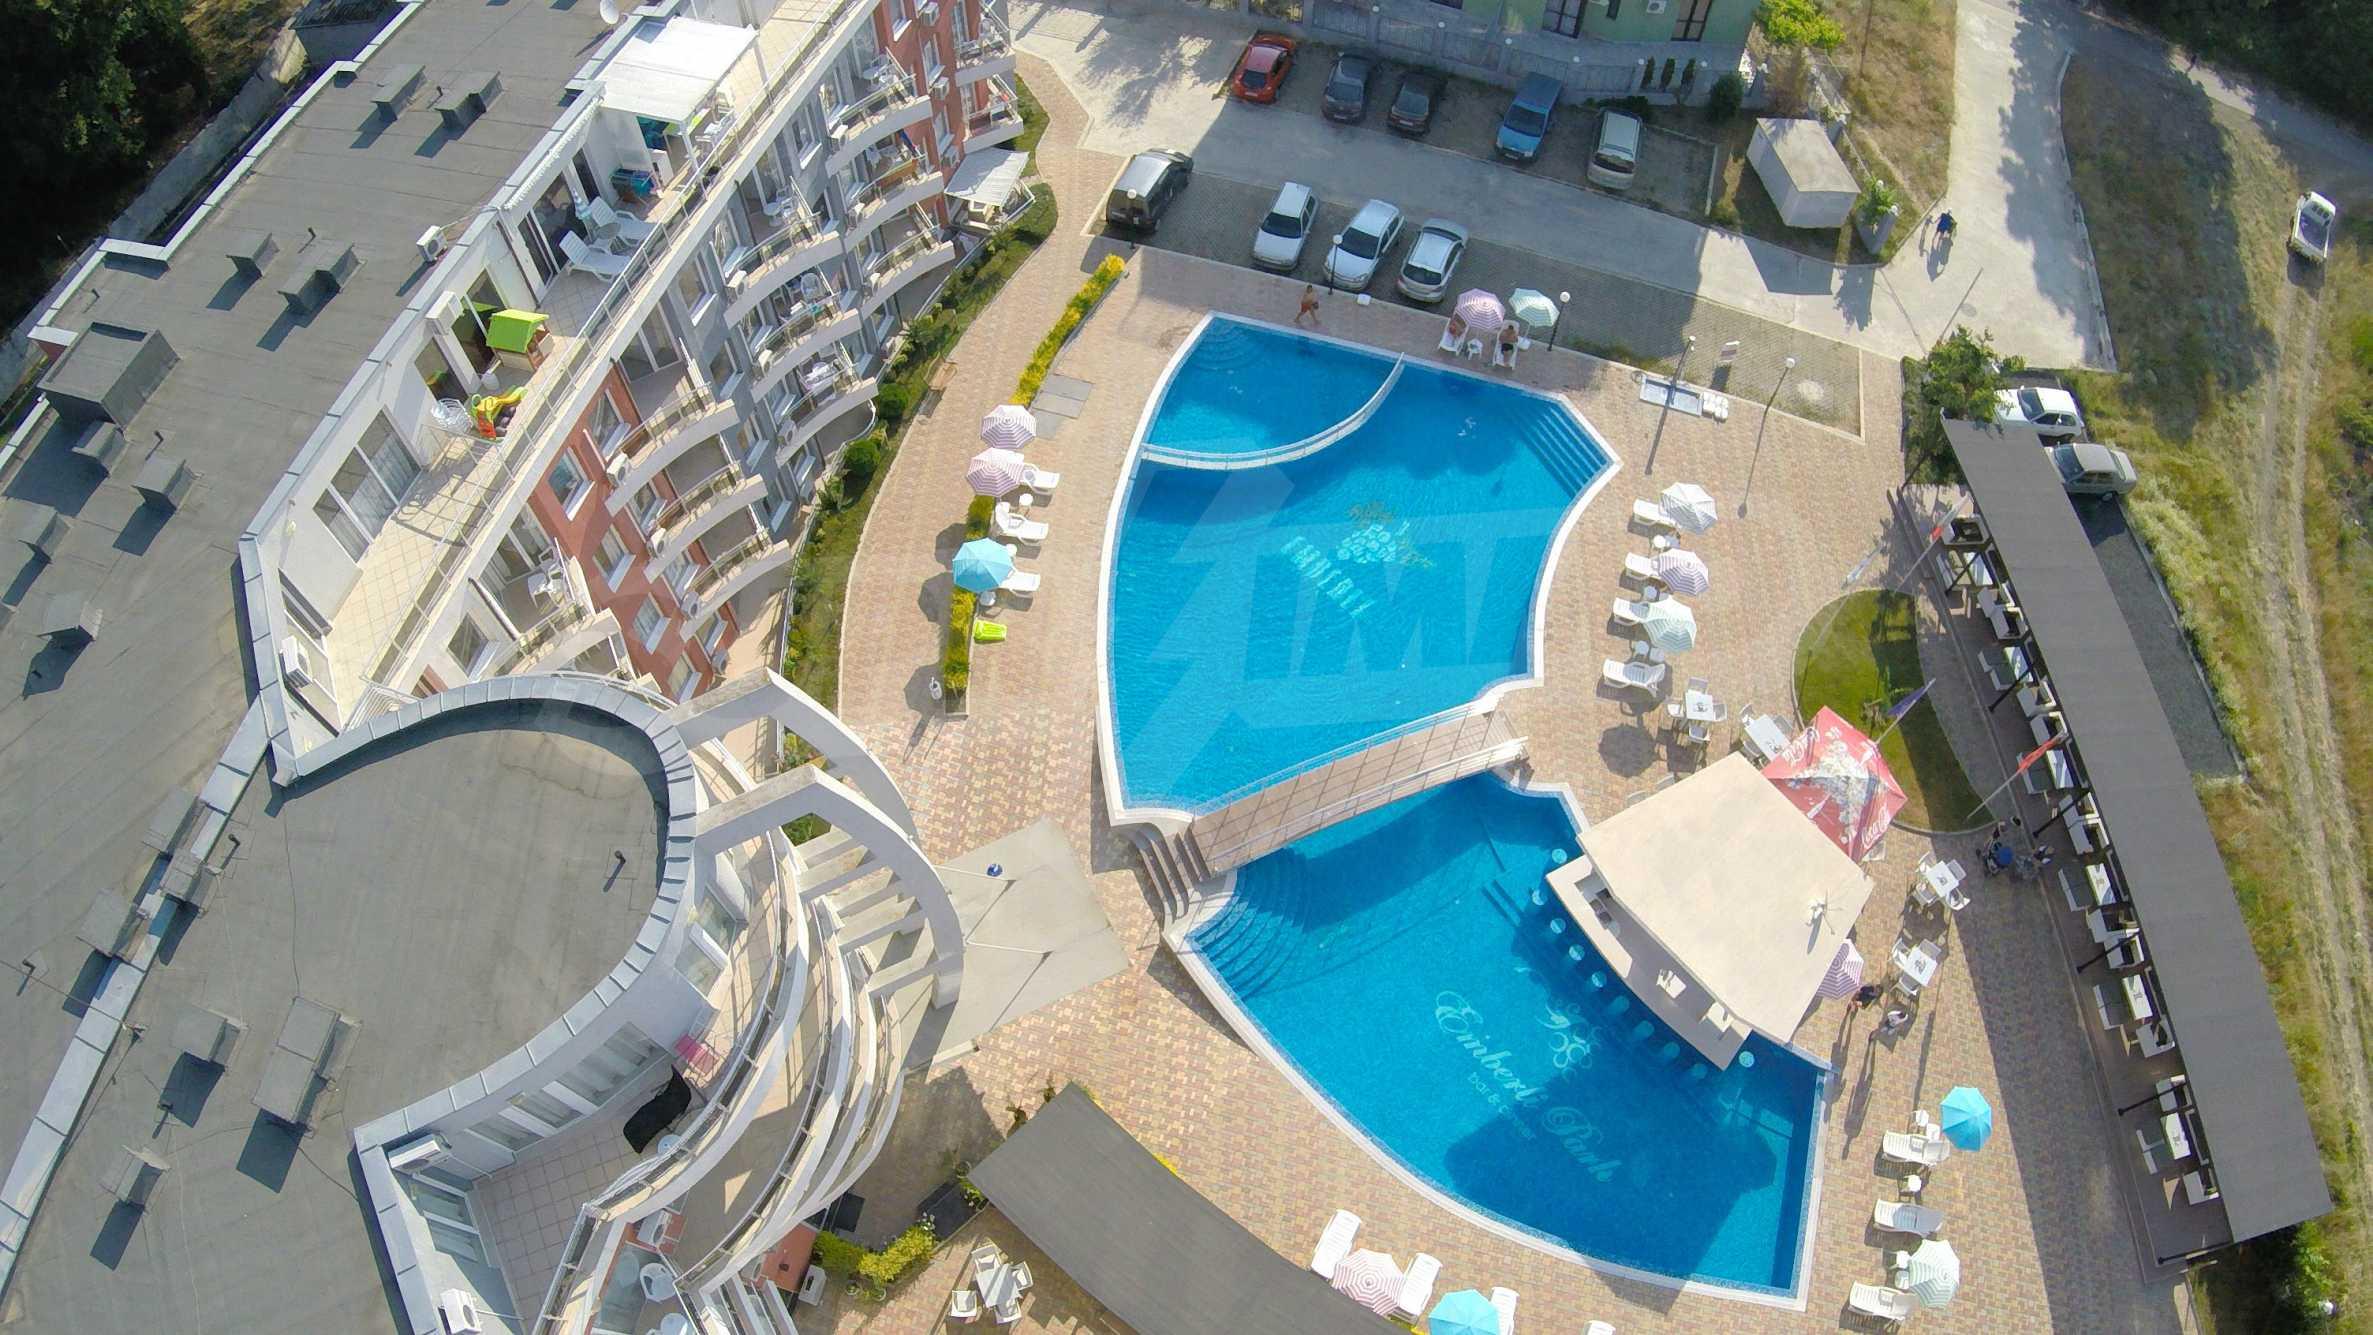 Трехкомнатный апартамент на продажу в комплексе Emberli в курорте Лозенец 28